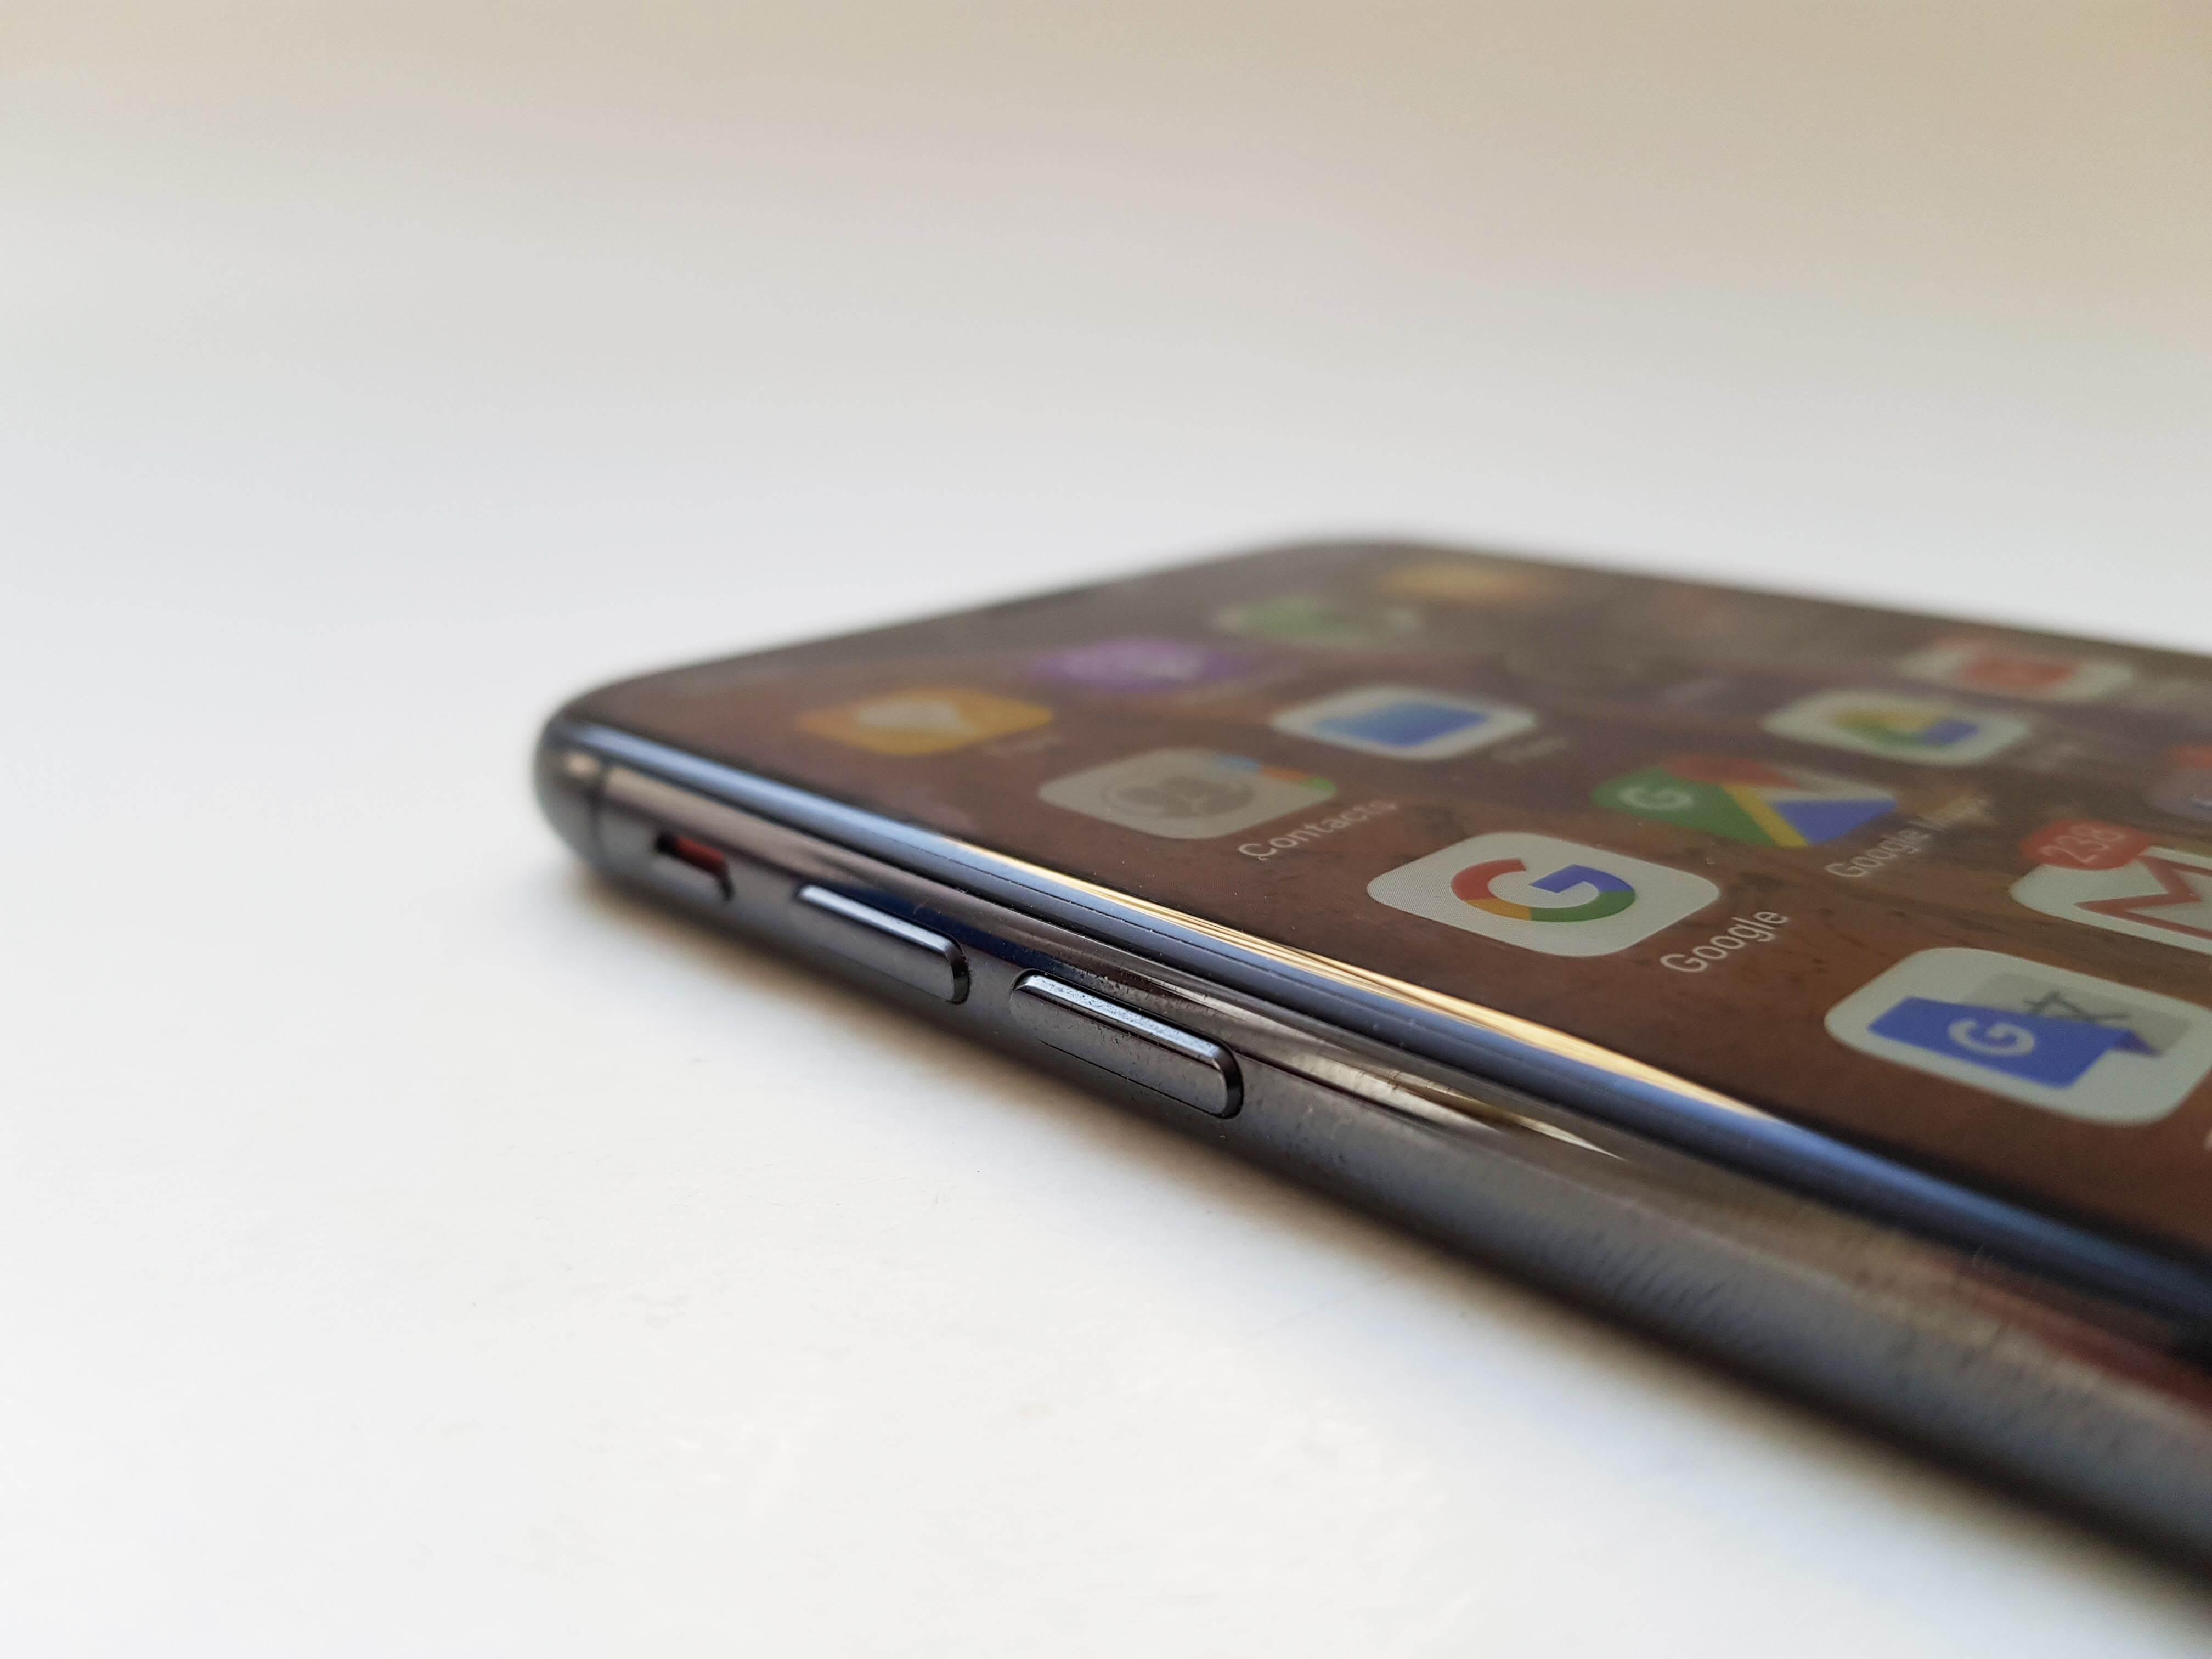 Apple iPhone Xs Review Romana si Pareri - Foto 5